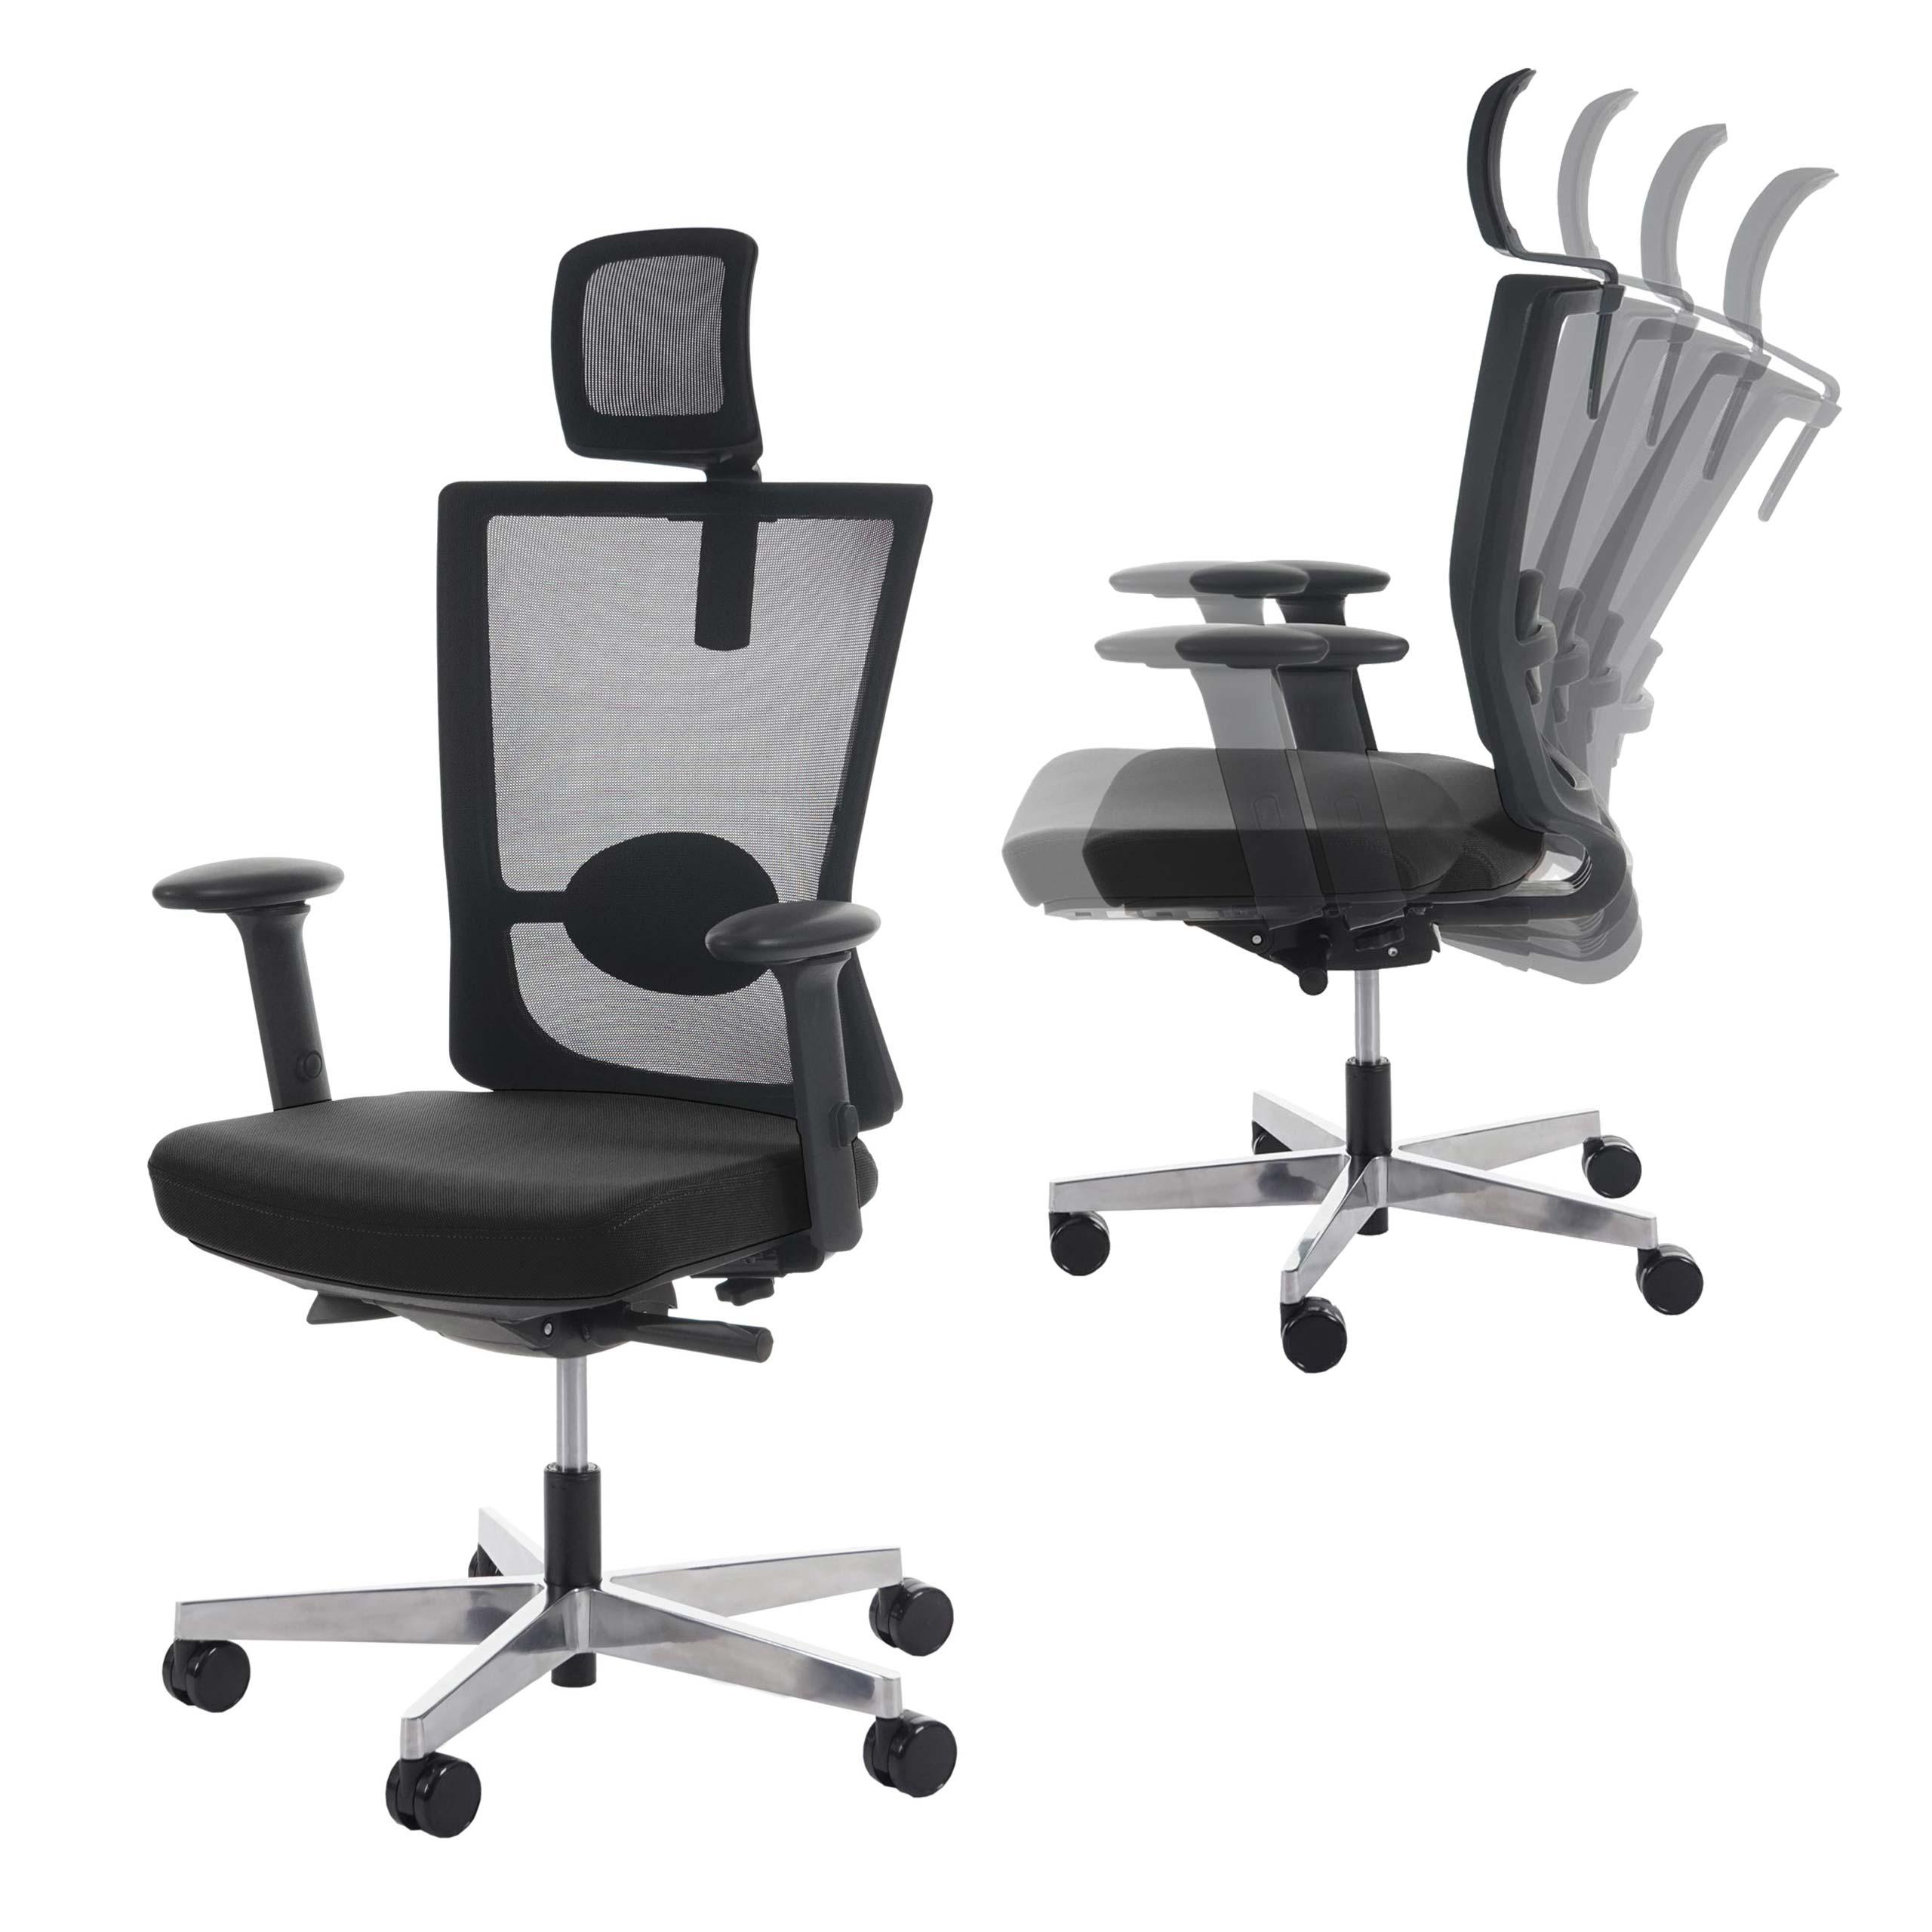 Drehstuhl ergonomisch  Bürostuhl Drammen, Schreibtischstuhl Drehstuhl, Kopfstütze ...